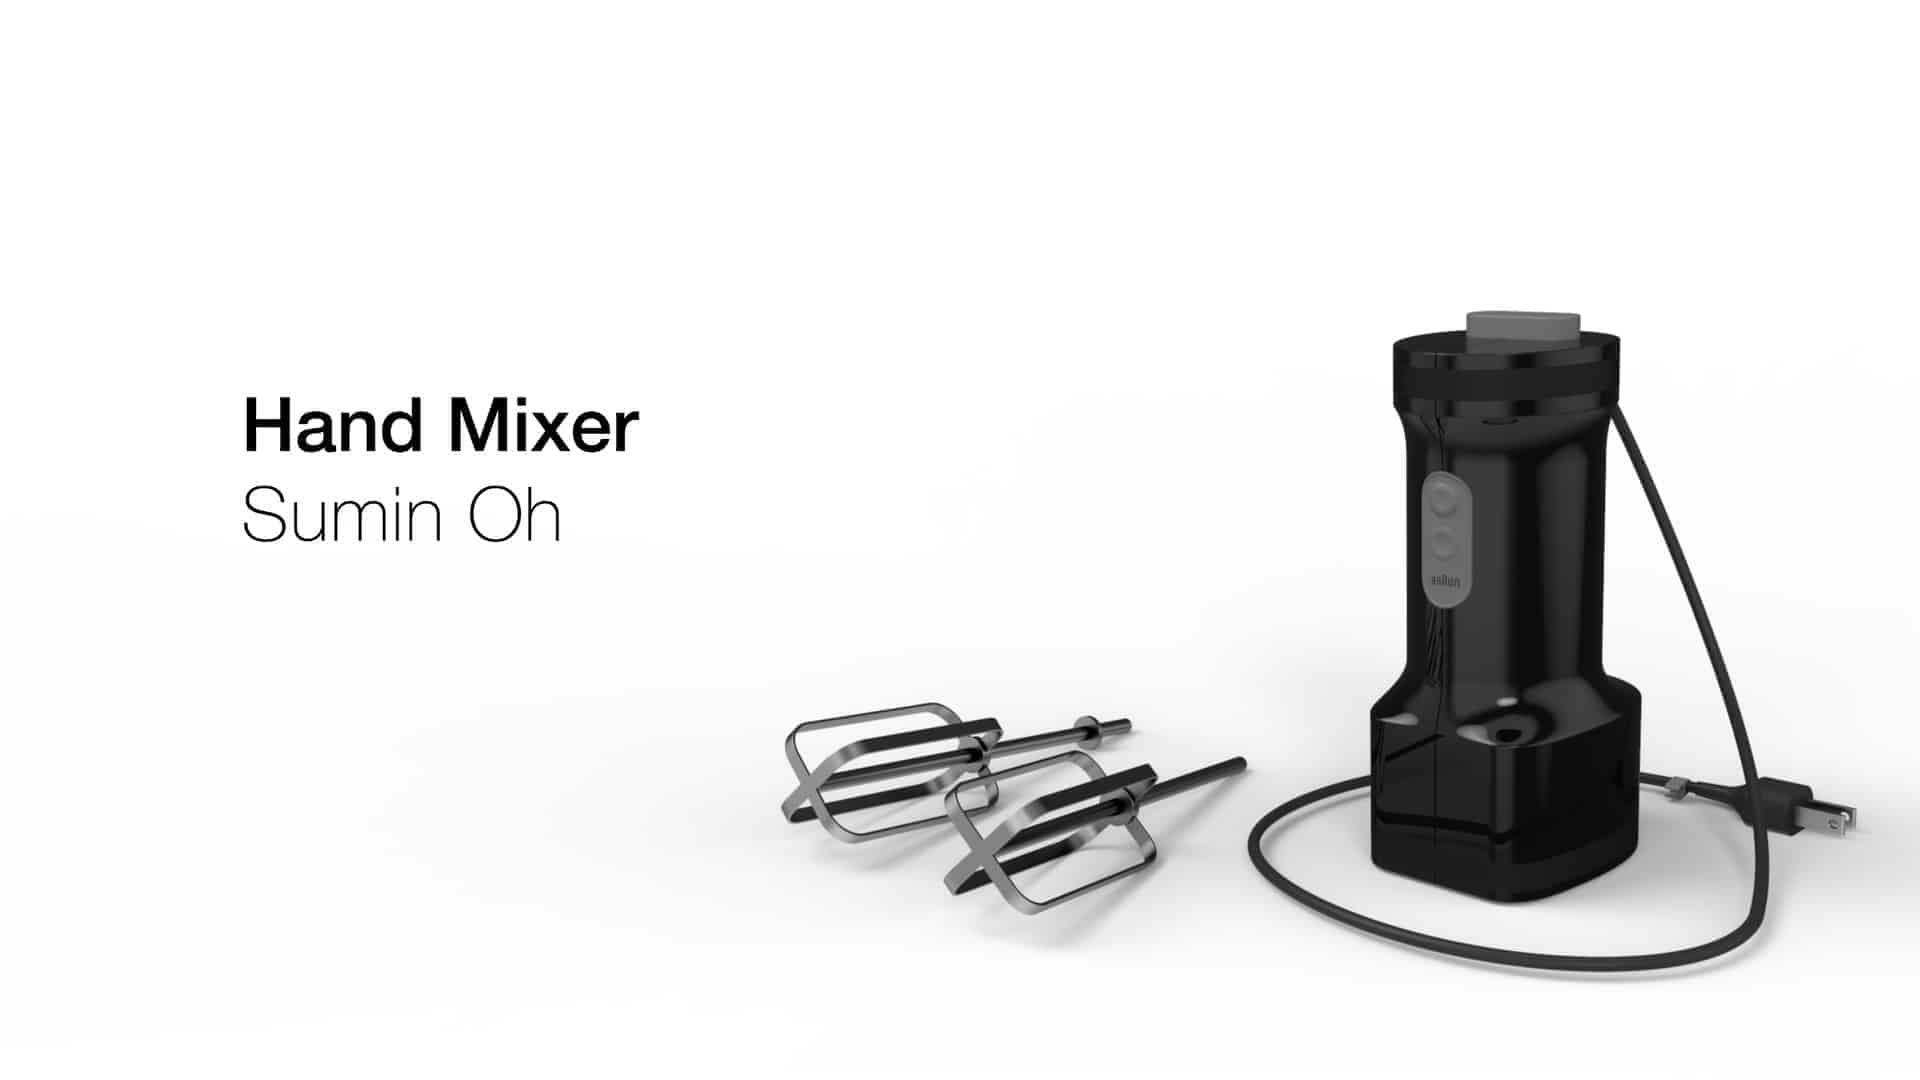 hand mixer design ideas. Black Bedroom Furniture Sets. Home Design Ideas